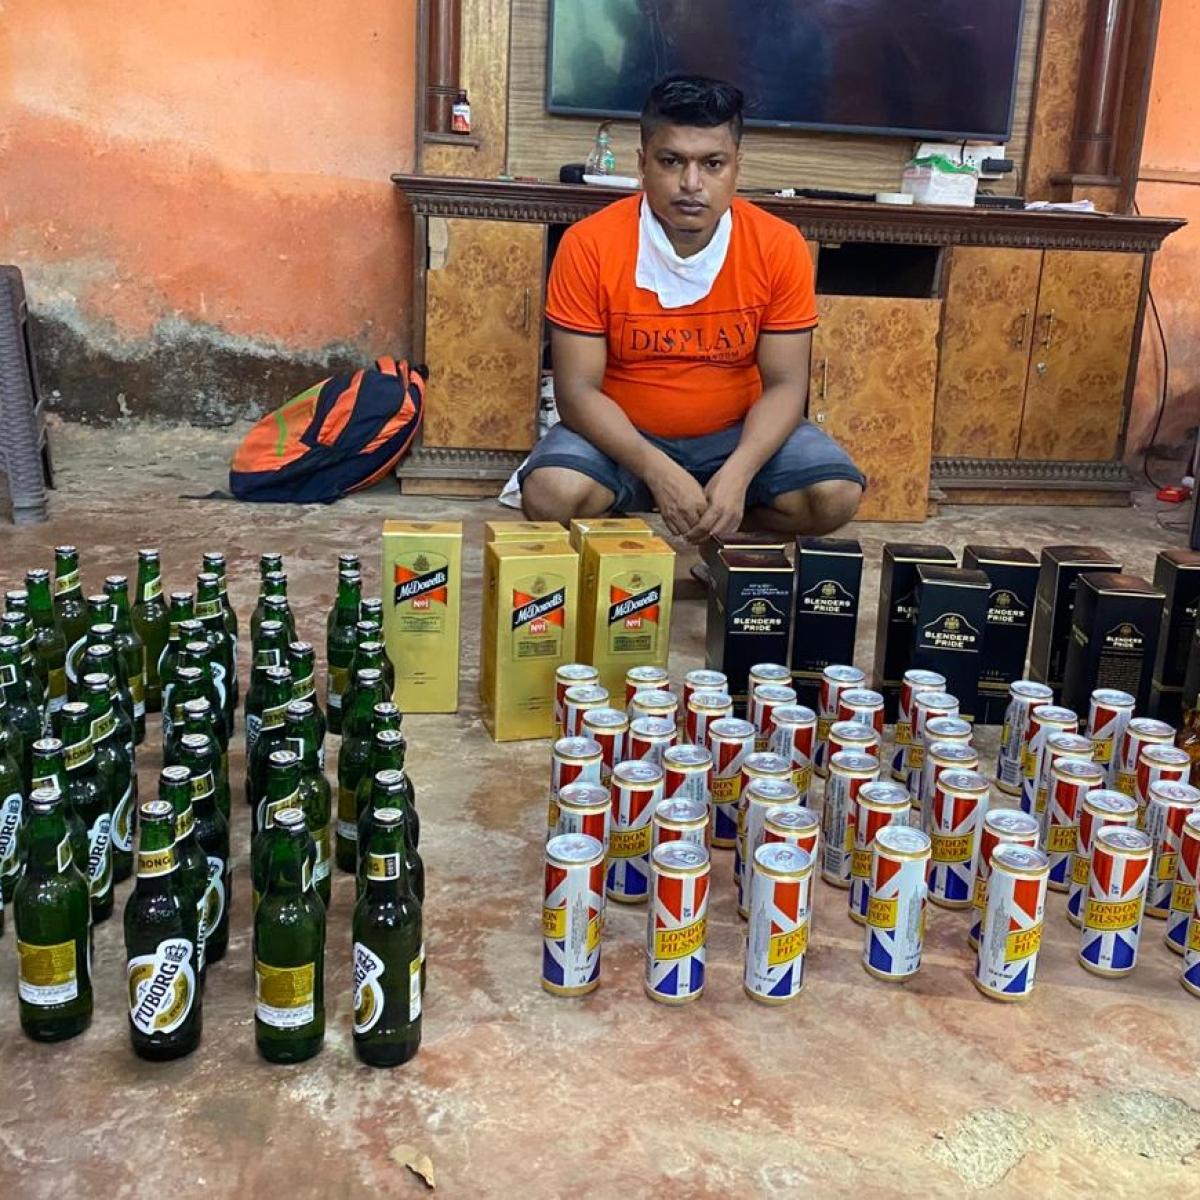 Navi Mumbai: 118 bottles of Indian-made foreign liquor seized from unemployed man